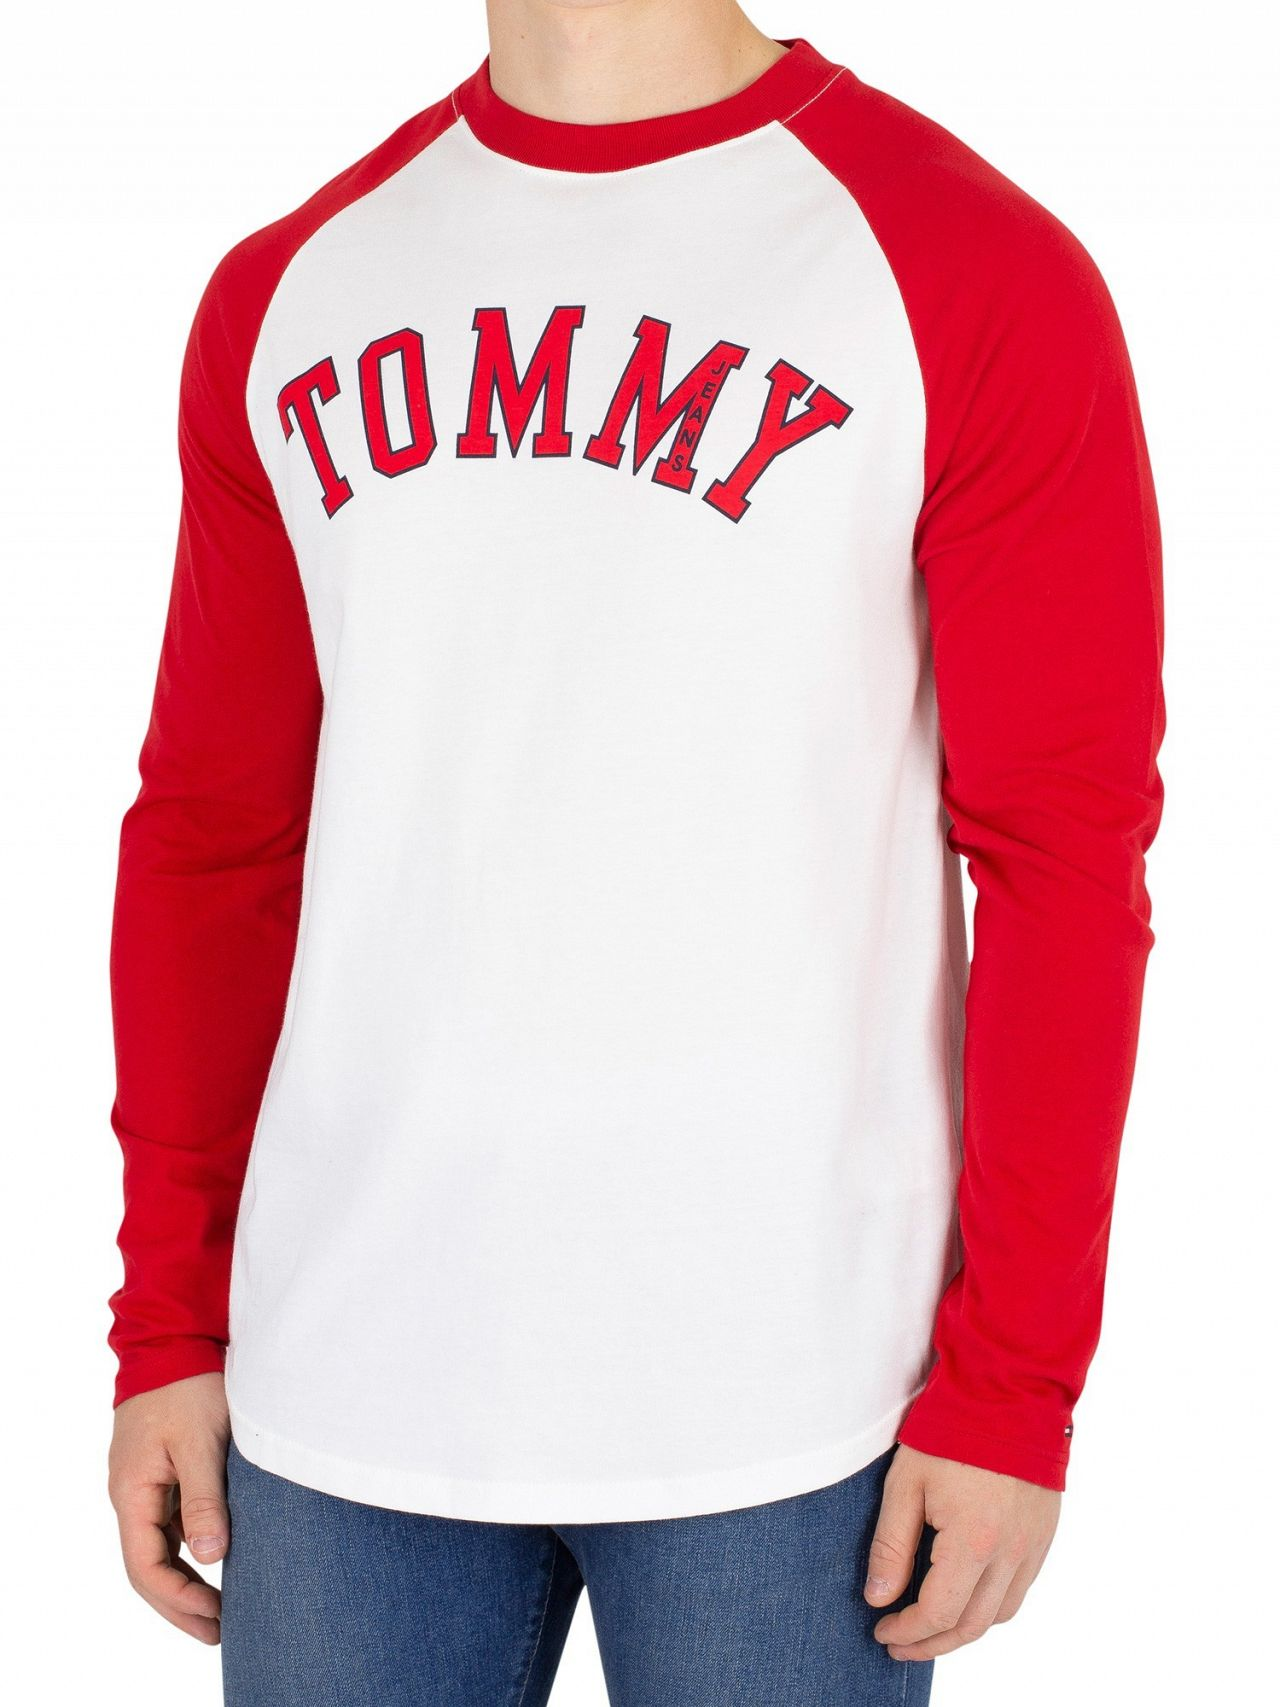 2a1b5e8a Tommy Jeans Samba/Classic White Raglan Baseball T-Shirt | Standout